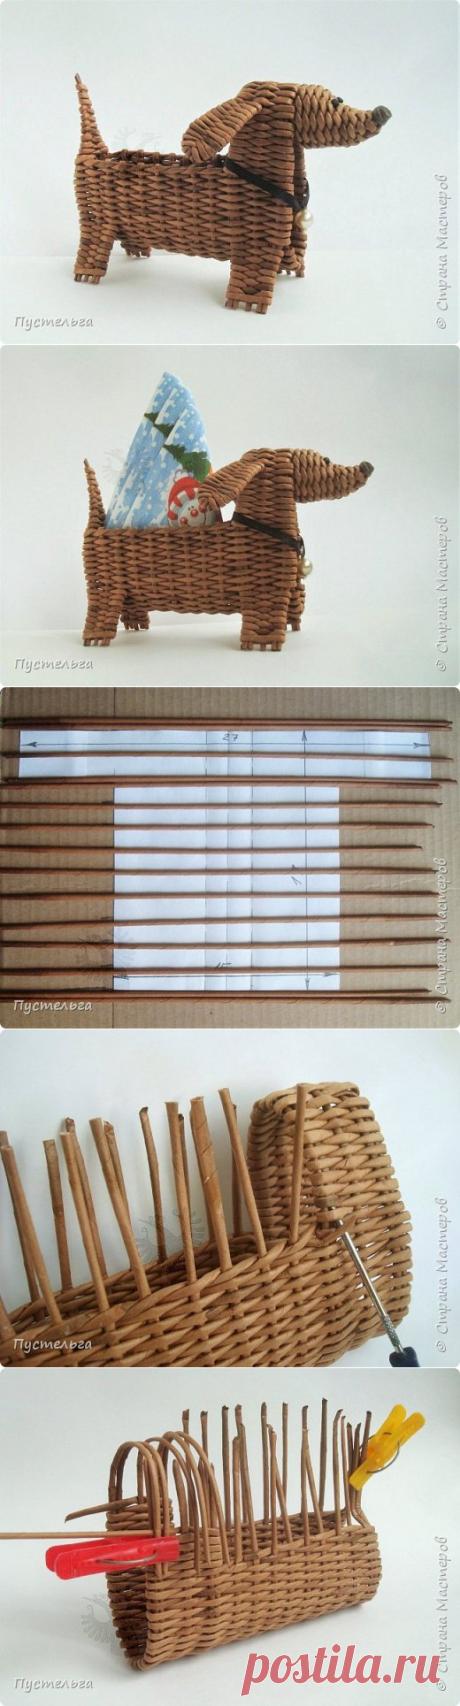 Корзинка-собачка для новогоднего стола